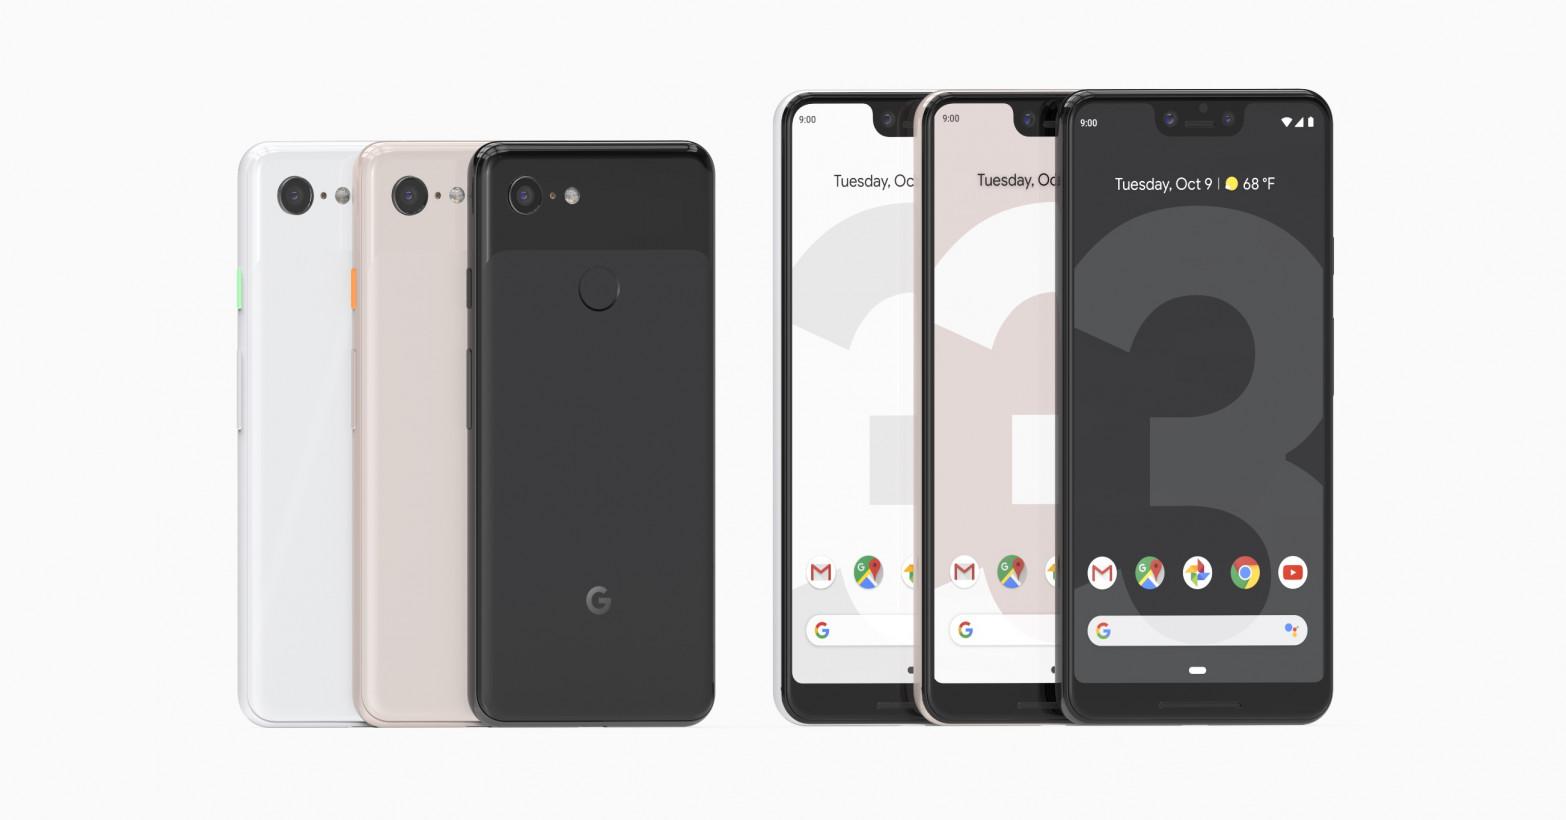 Google's Pixel 3 brings smarter selfies, better zoom, and wireless charging